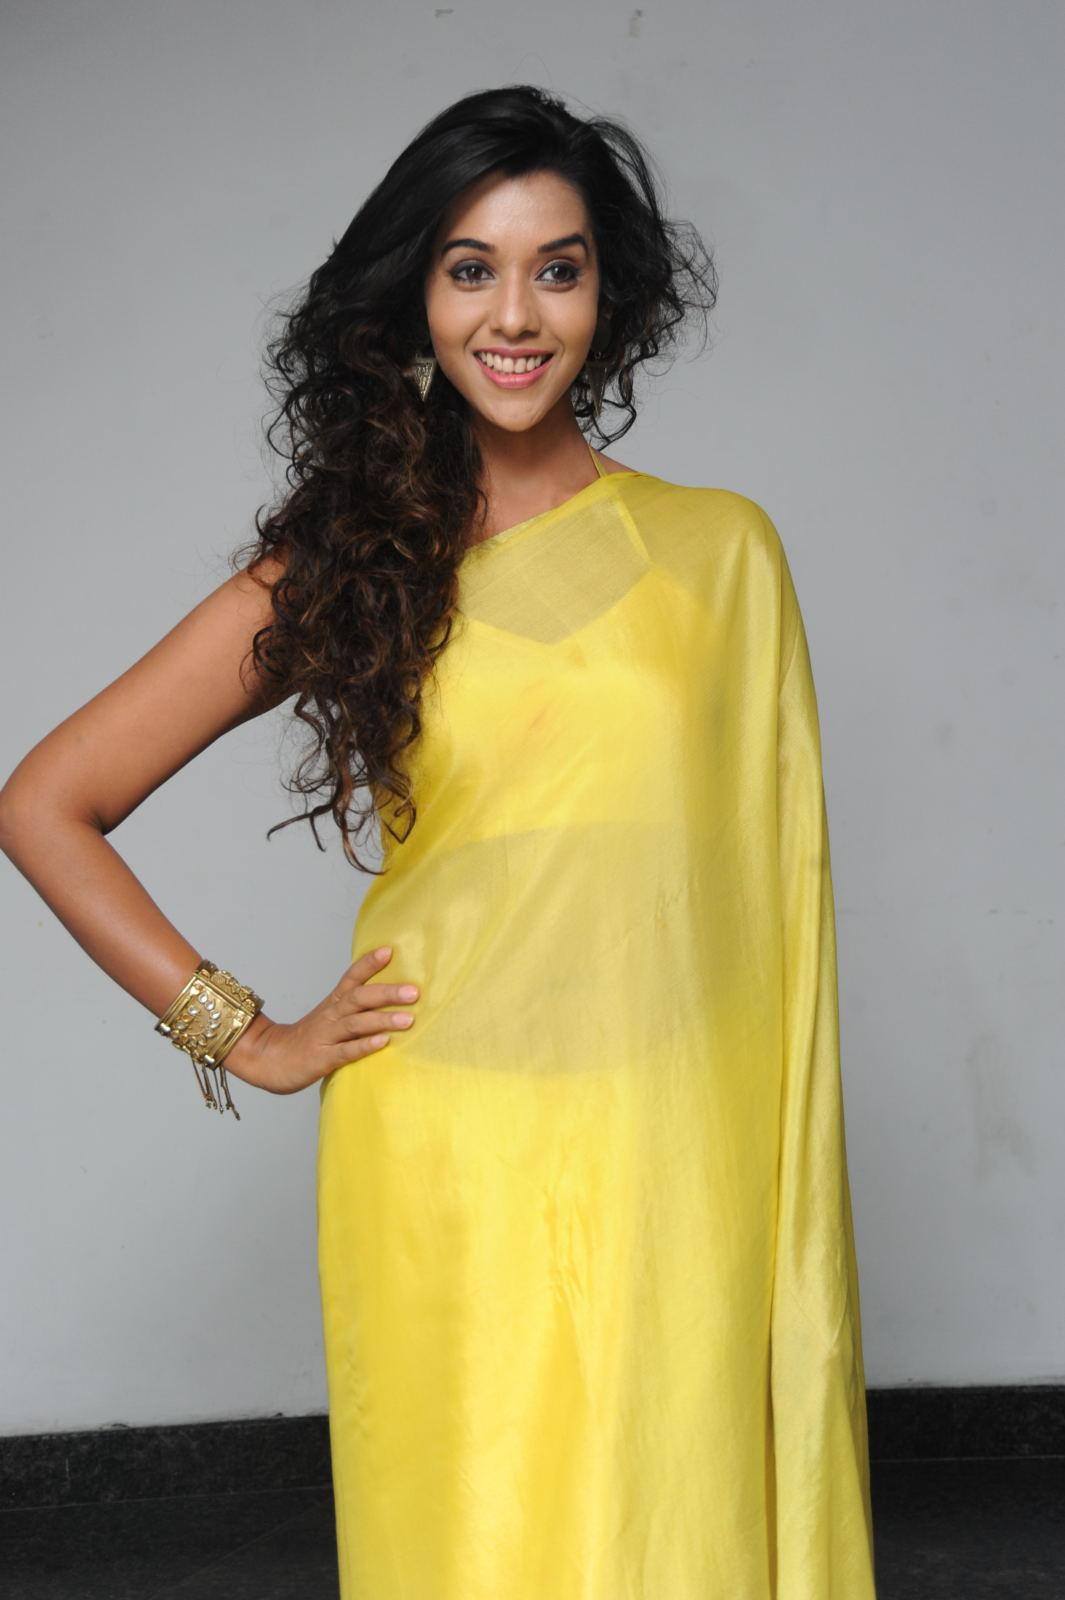 Splendid anu priya in yellow saree images gallery